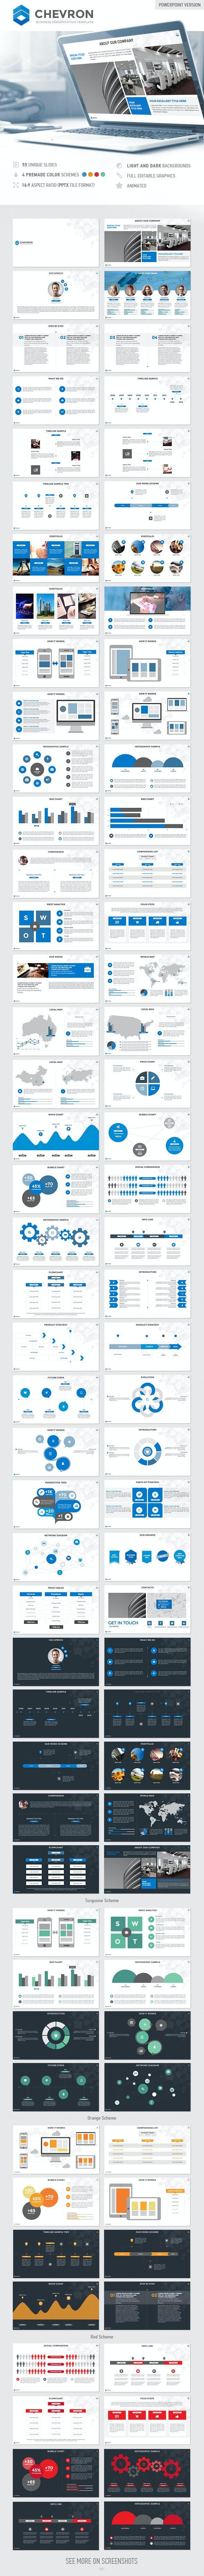 Chevron PowerPoint Presentation Template - PowerPoint Templates Presentation Templates